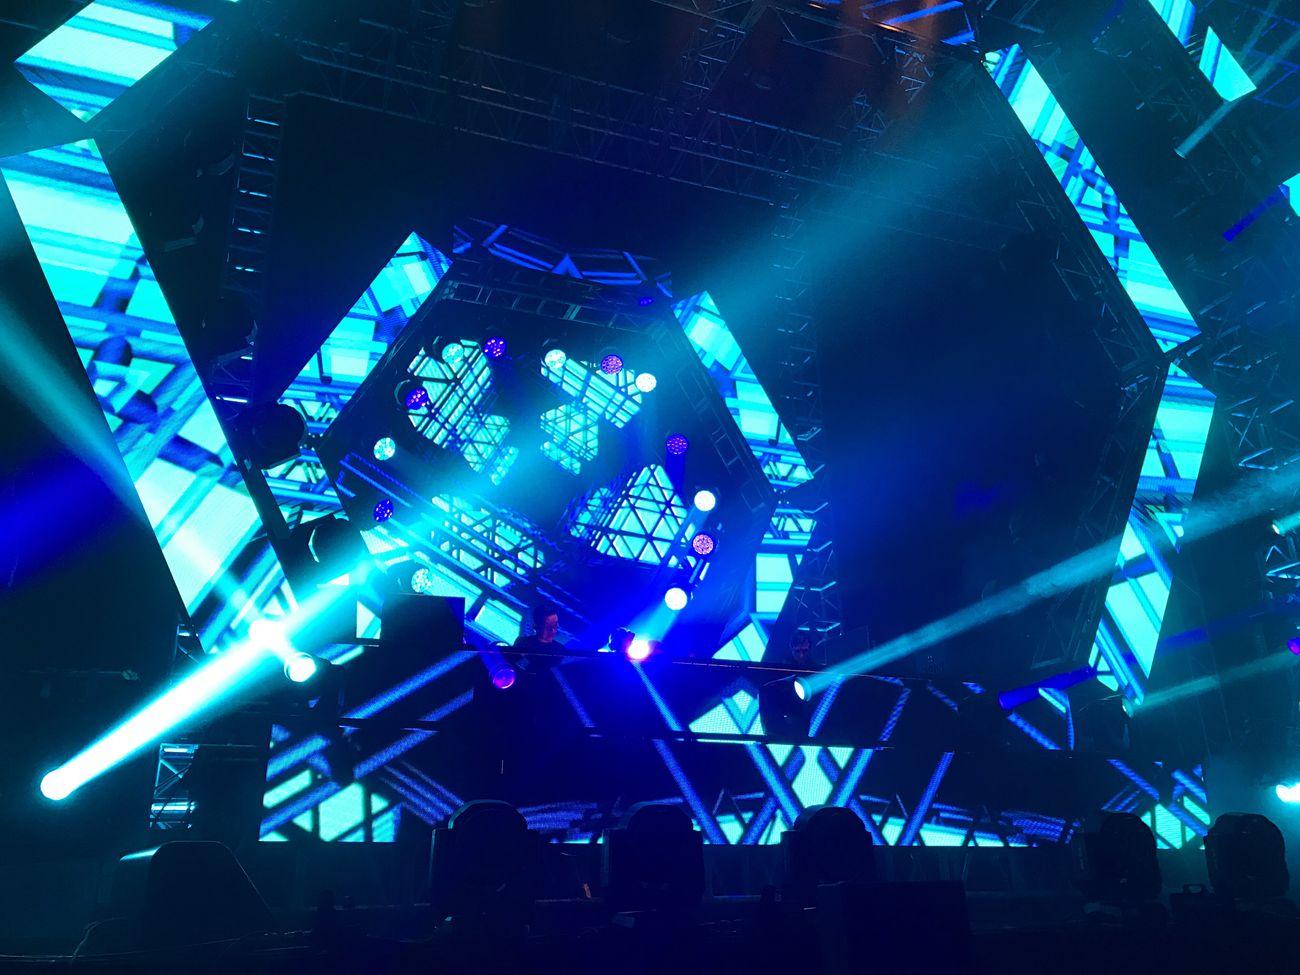 Golfish & Blink, Garuda Land - DWP16, Joexpo Kemayoran Djakarta Warehouse Project 2016 By ITag Djakarta Warehouse Project By ITag DanceMusicFestival By ITag Live In Concert By ITag